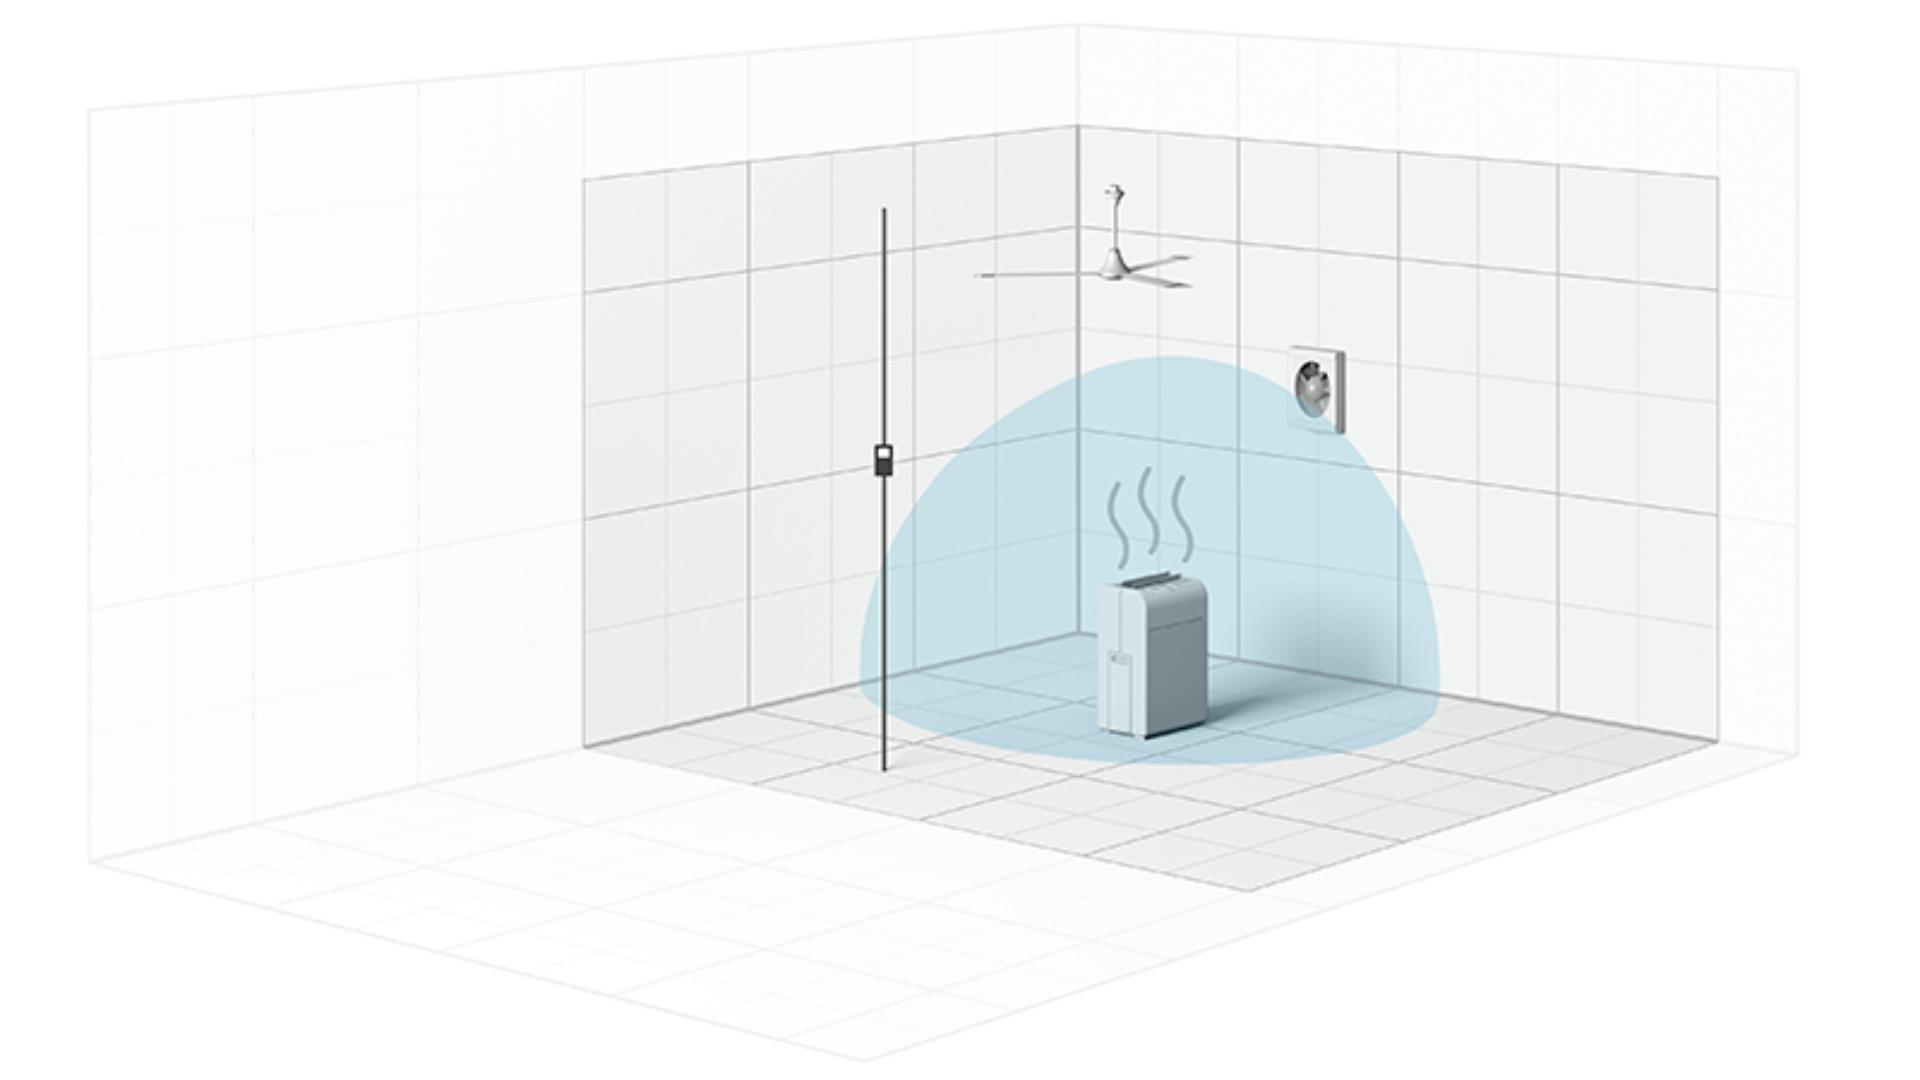 Graphic showing CADR air circulation test method